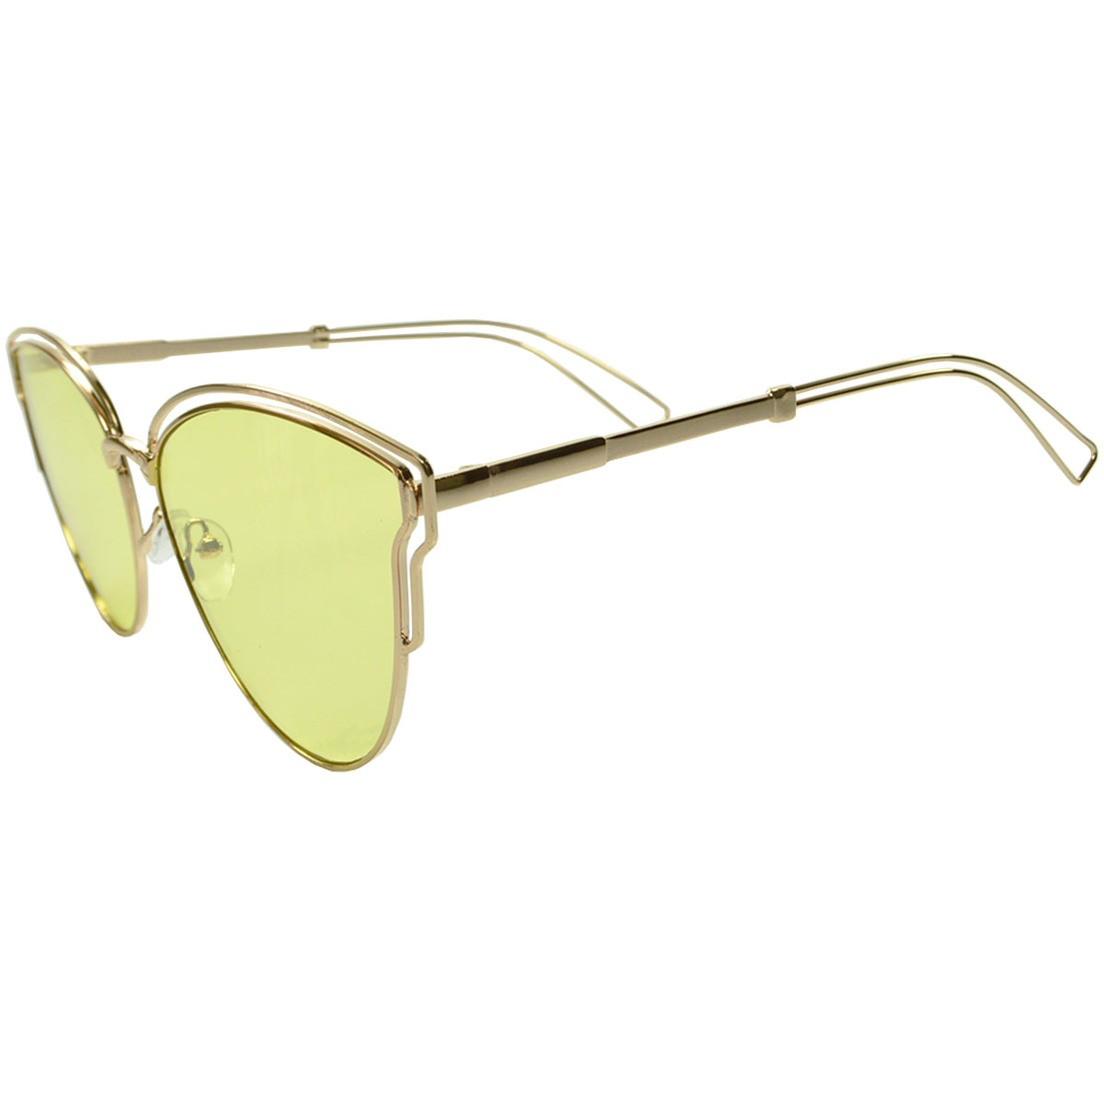 Óculos de Sol Mackage Feminino Metal Oversize Gateado - Dourado